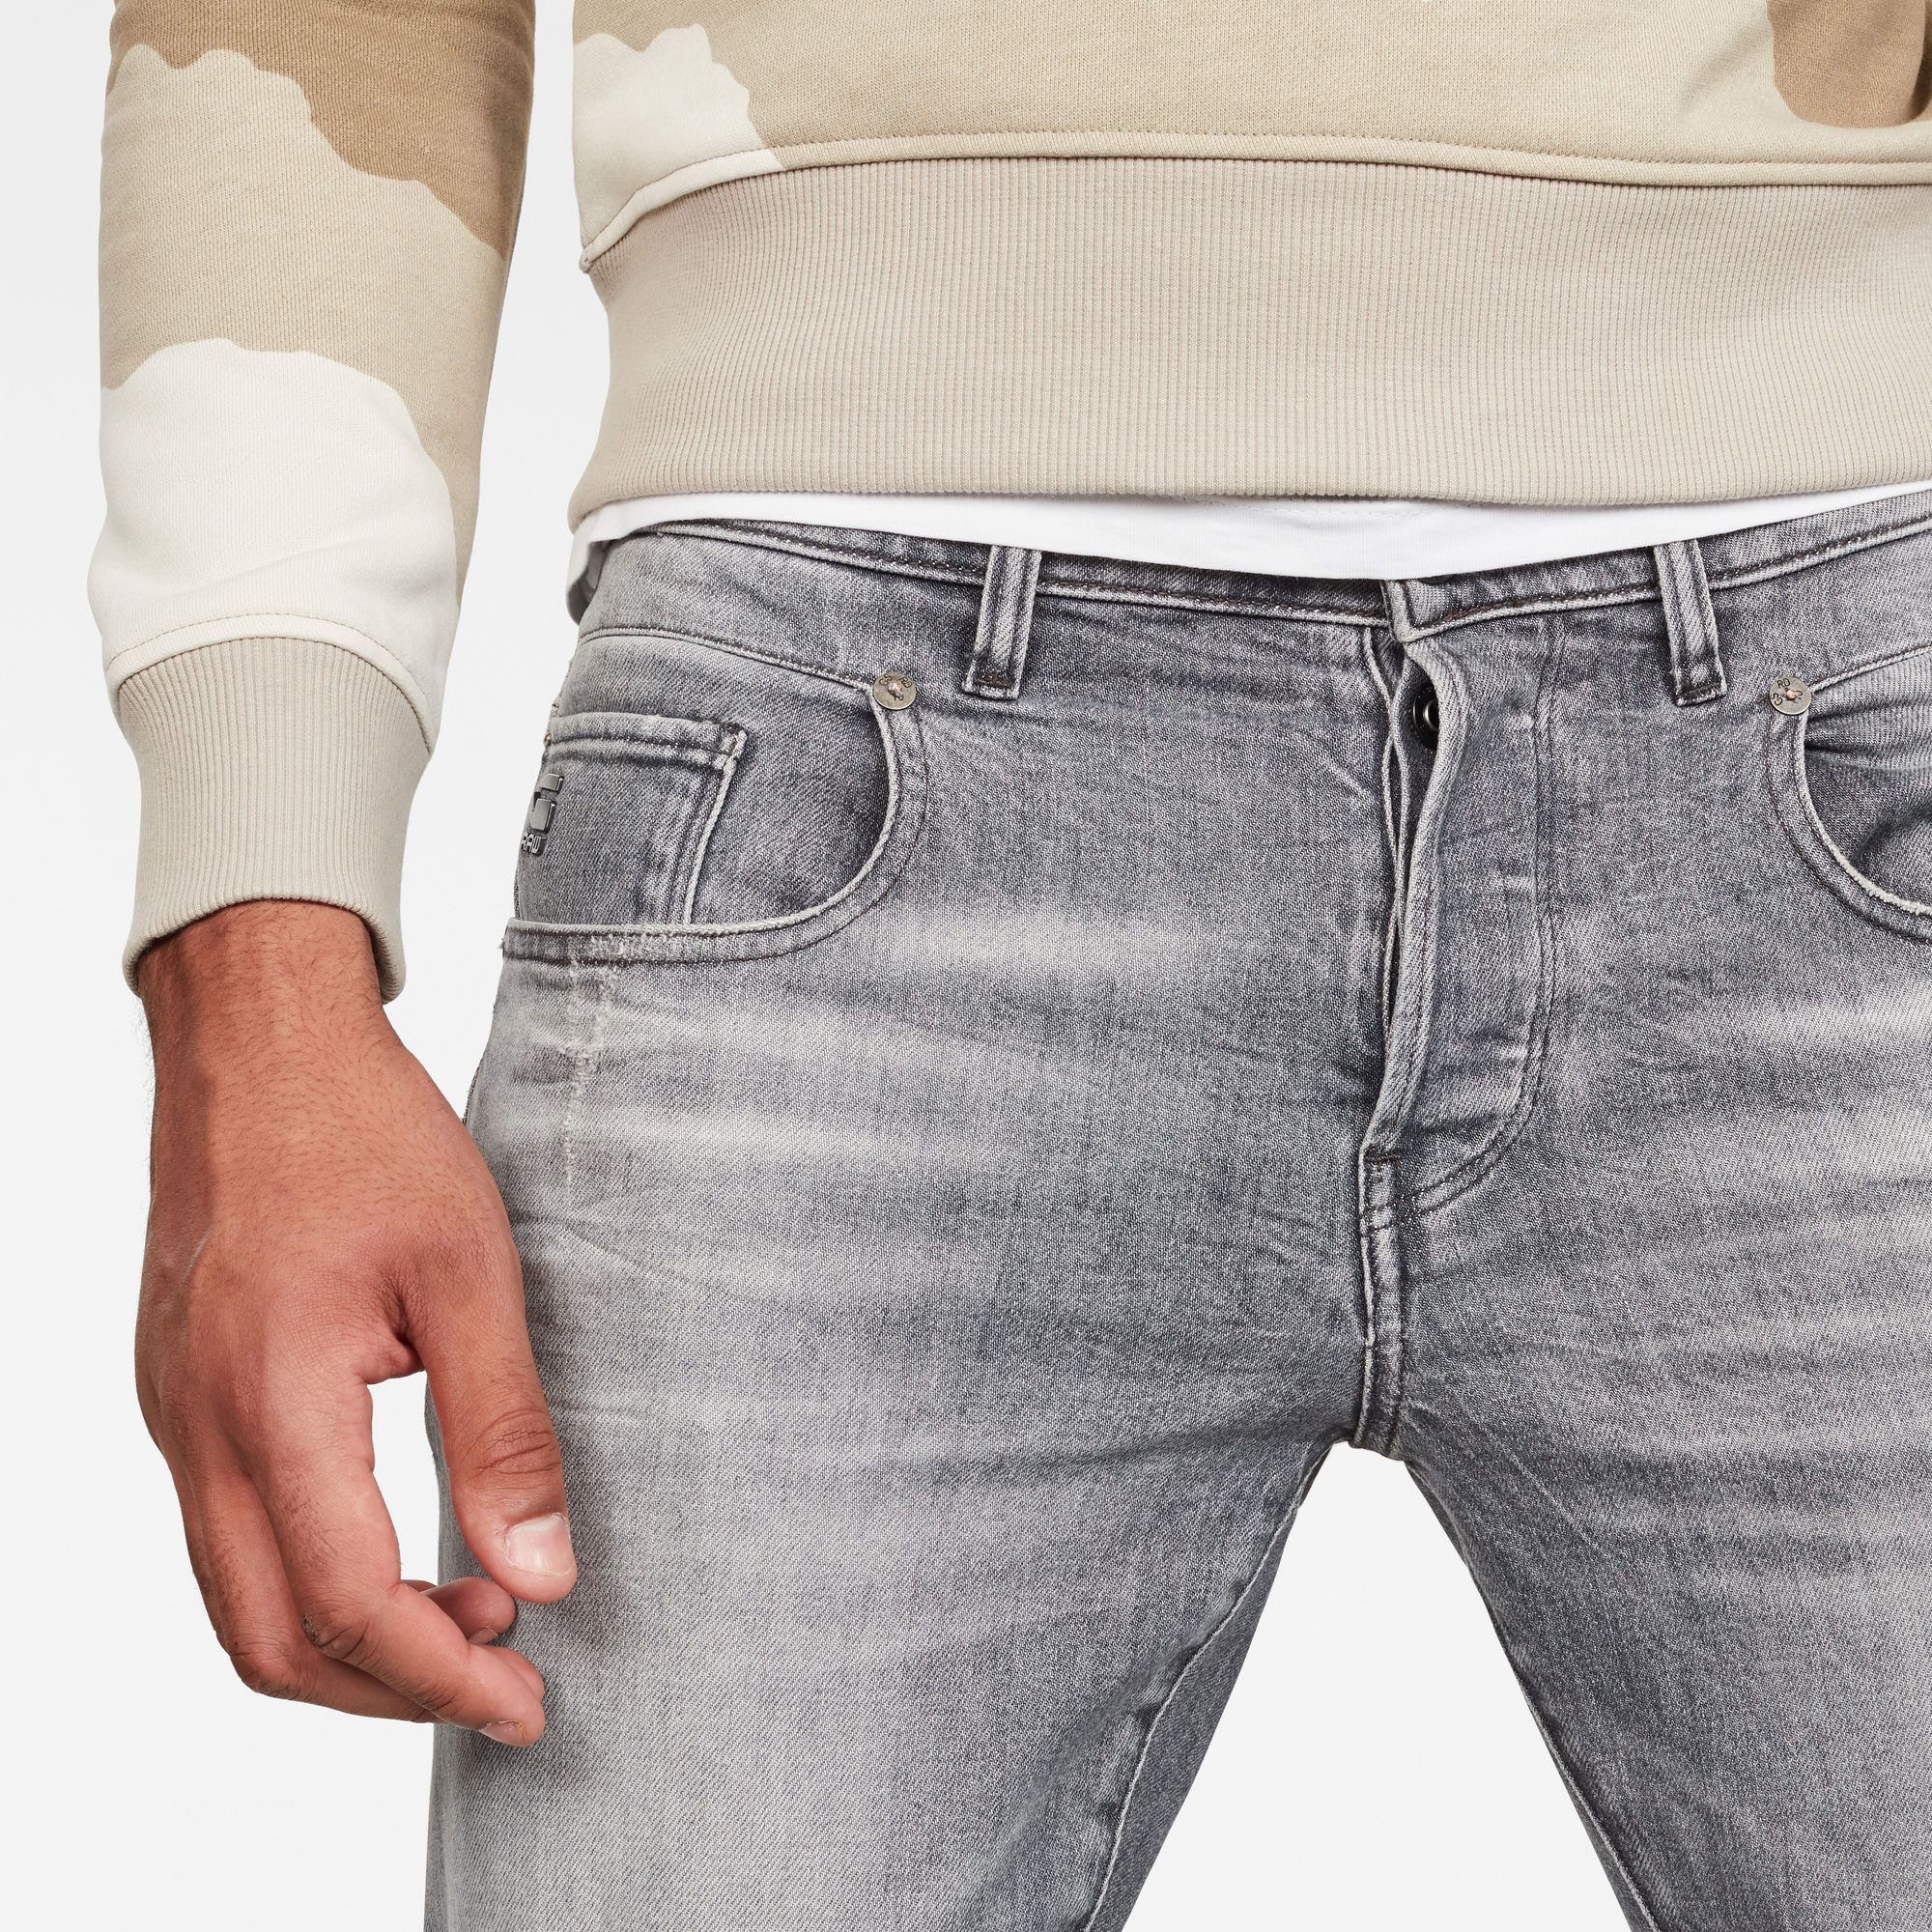 G-Star RAW Radar Straight Tapered Jeans